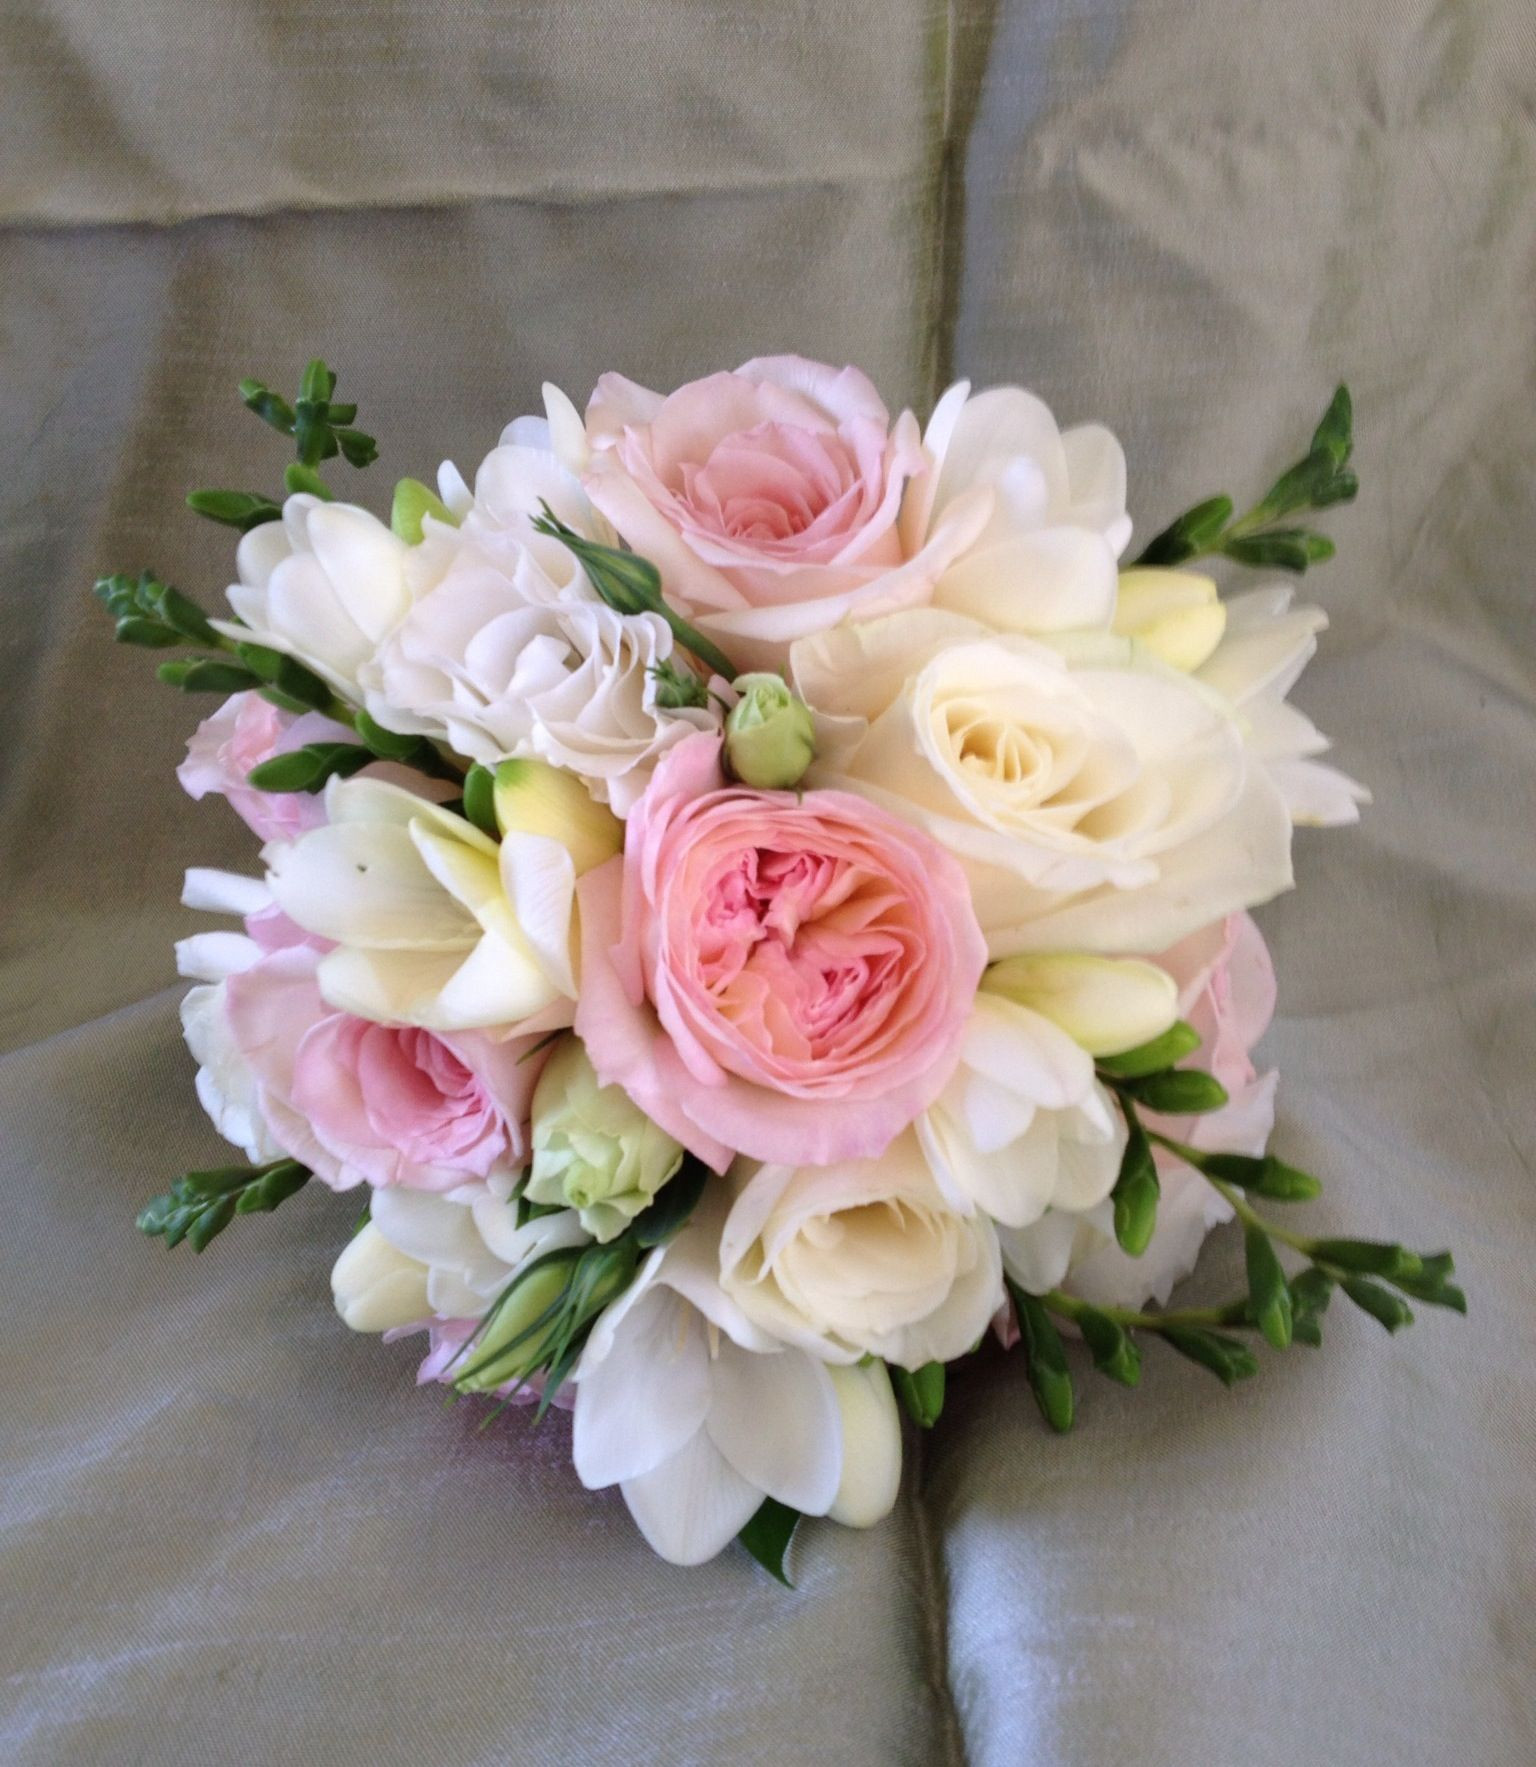 David Austin roses freesias and lisianthus